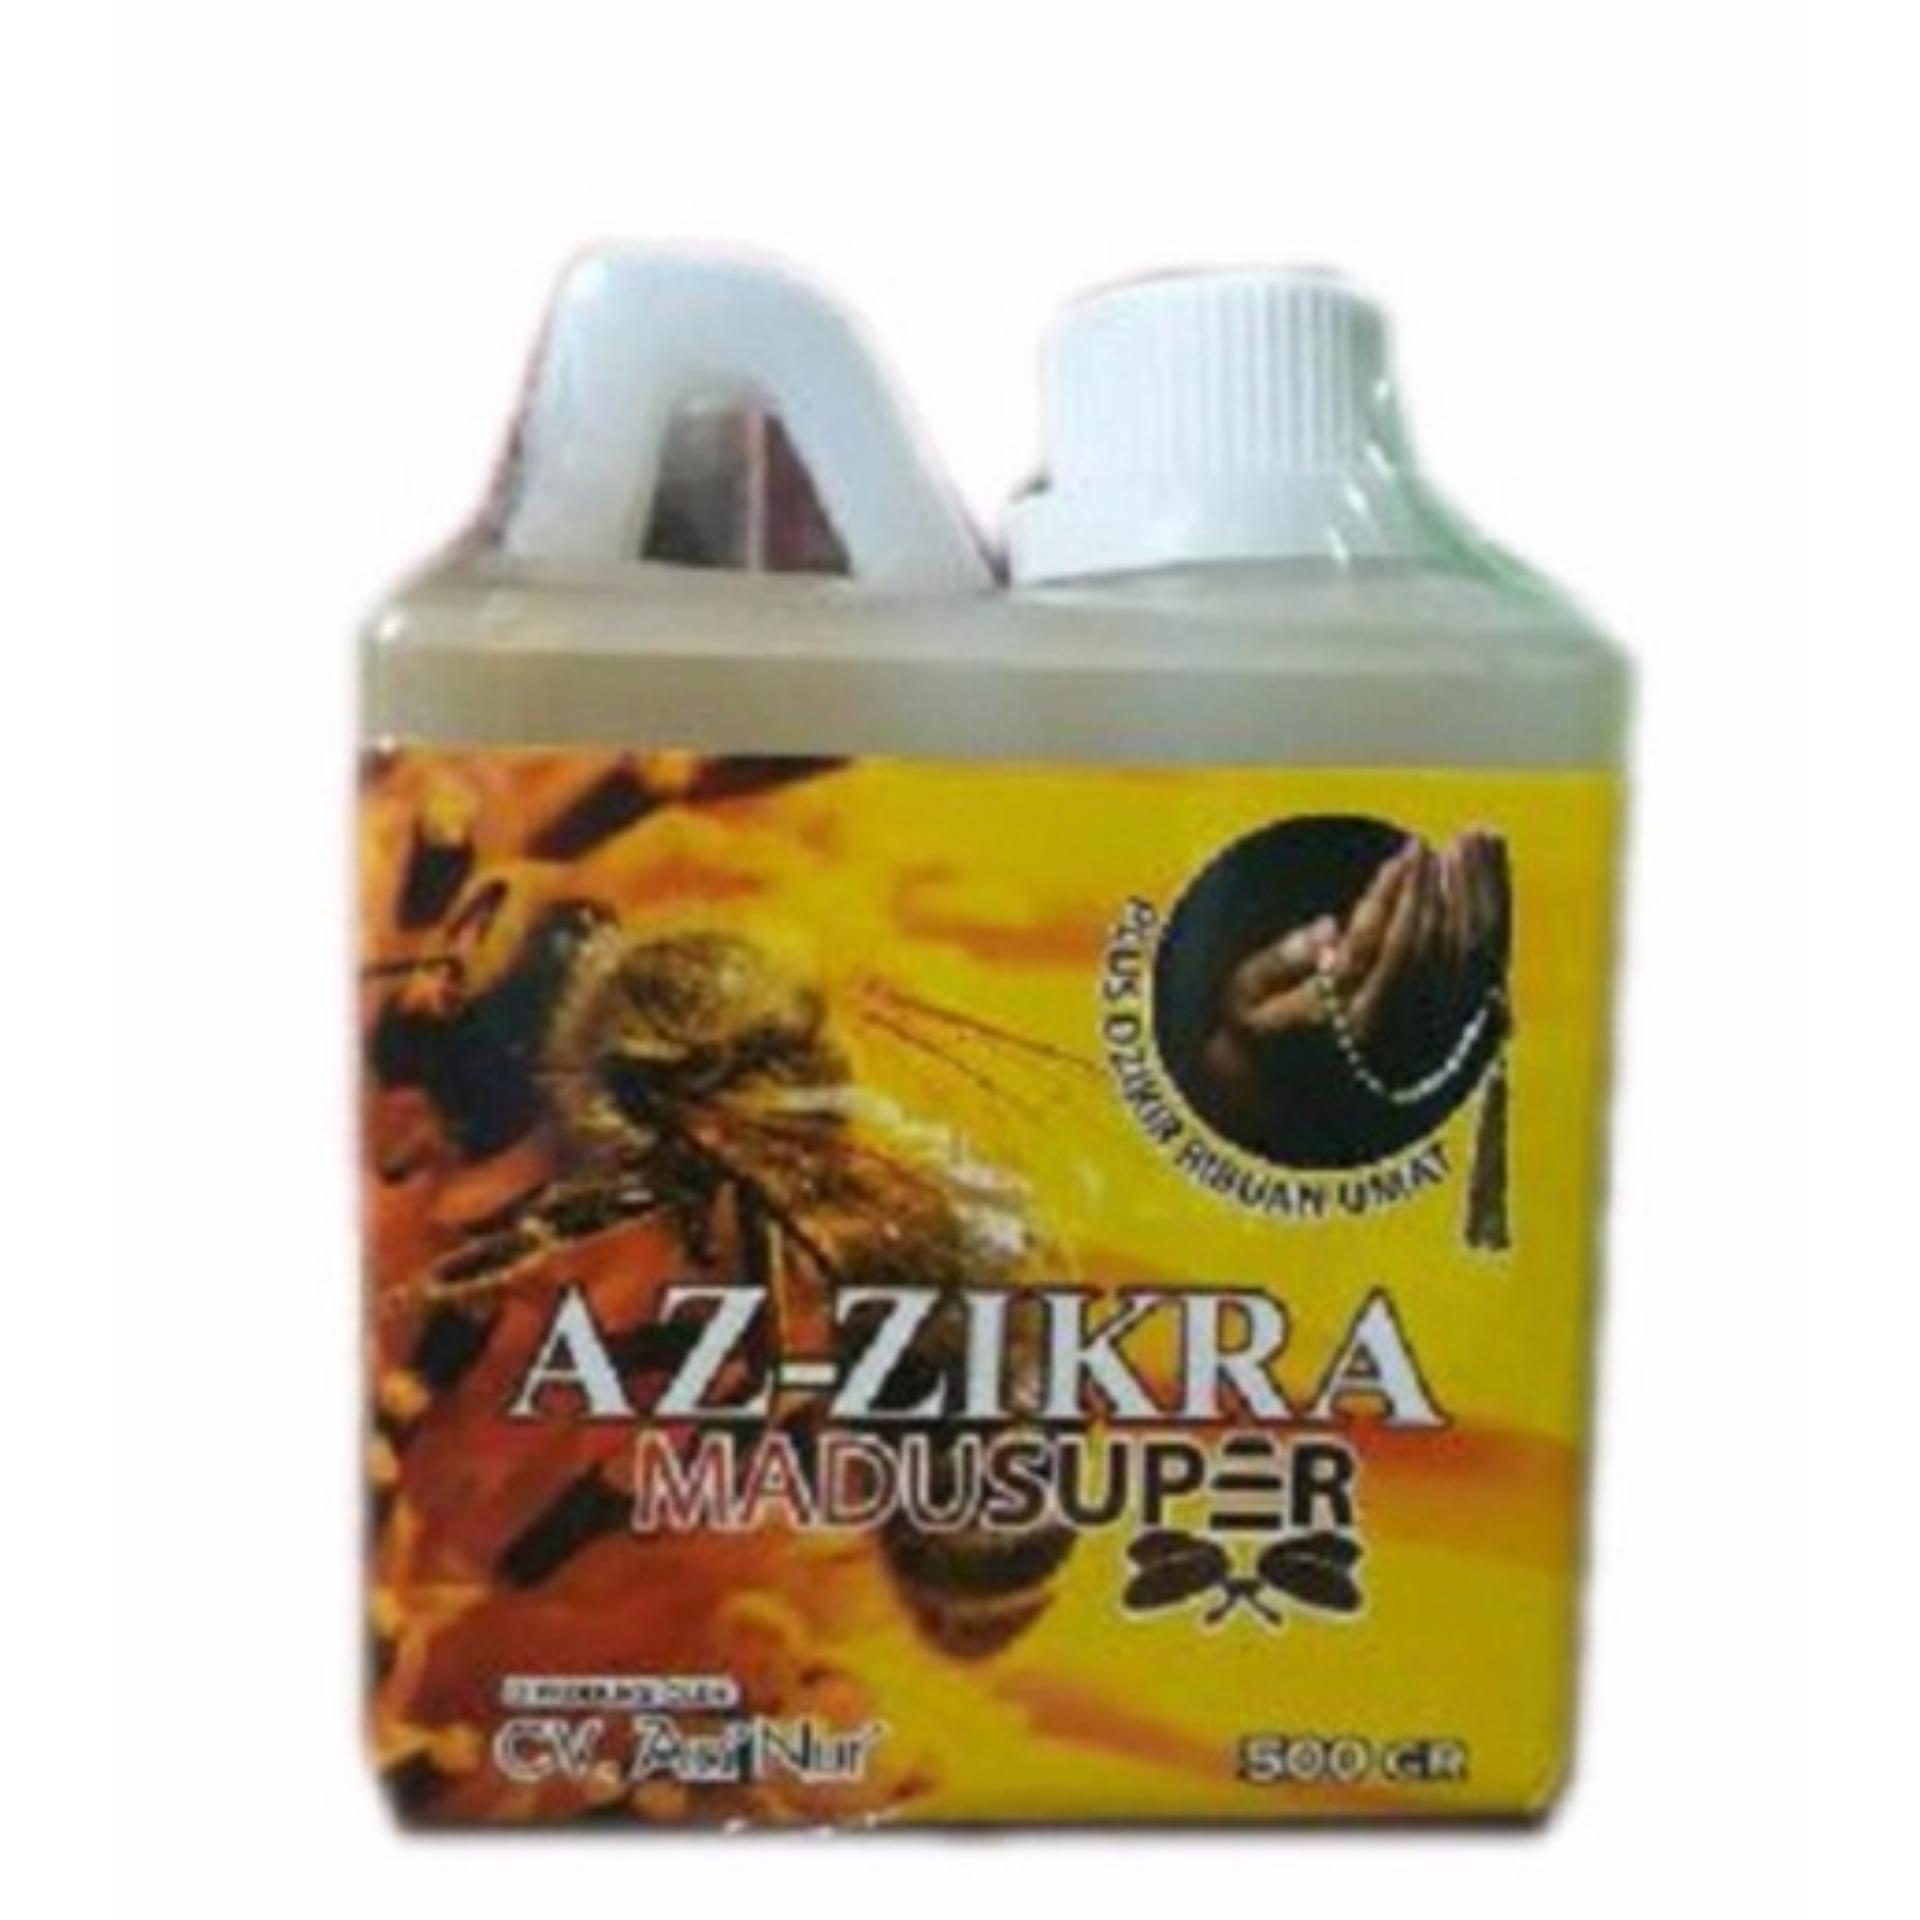 ... ZIE Madu Super Az Zikra 500 gr Doa Ustadz Arifin Ilham Asli Jaga Kesehatan ...